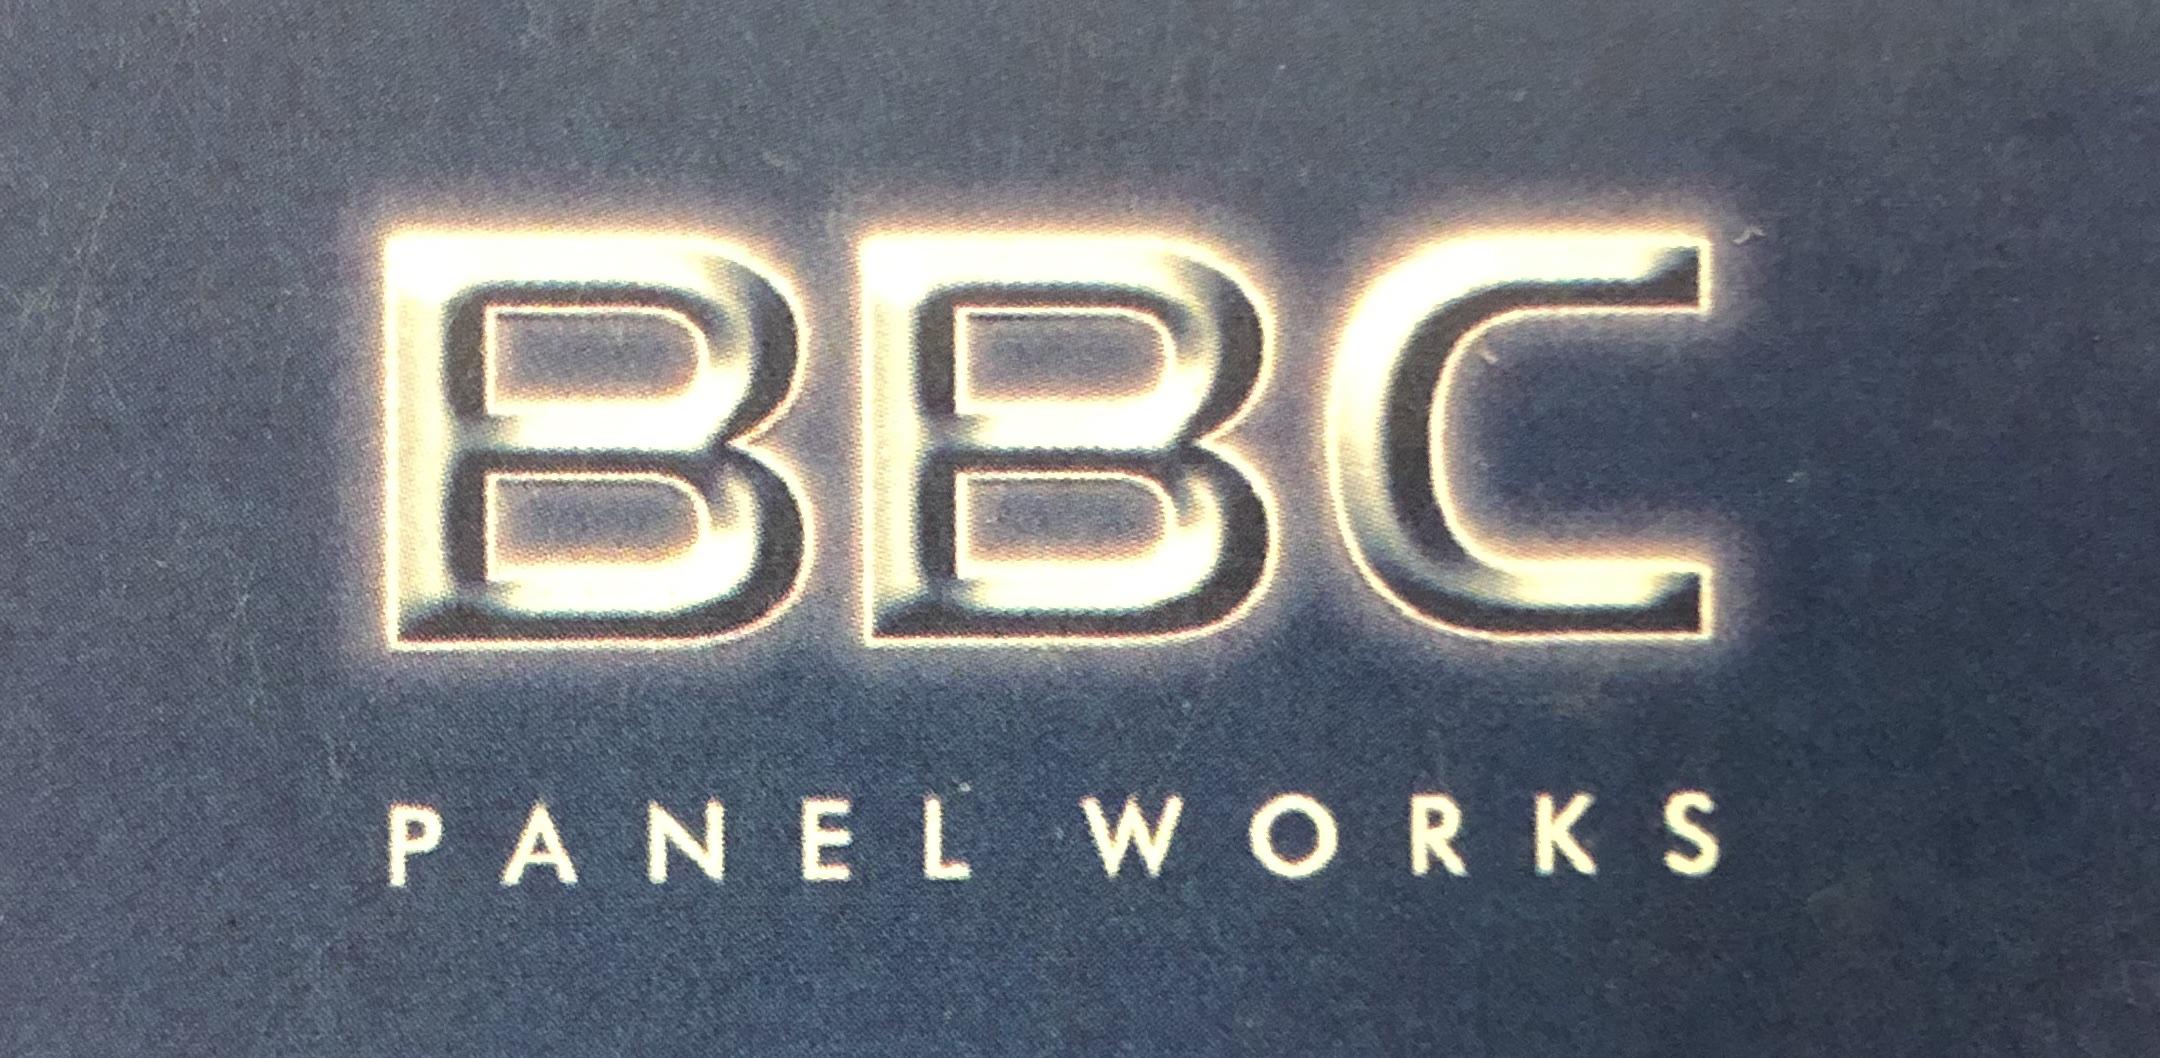 BBC Panel Works Logo